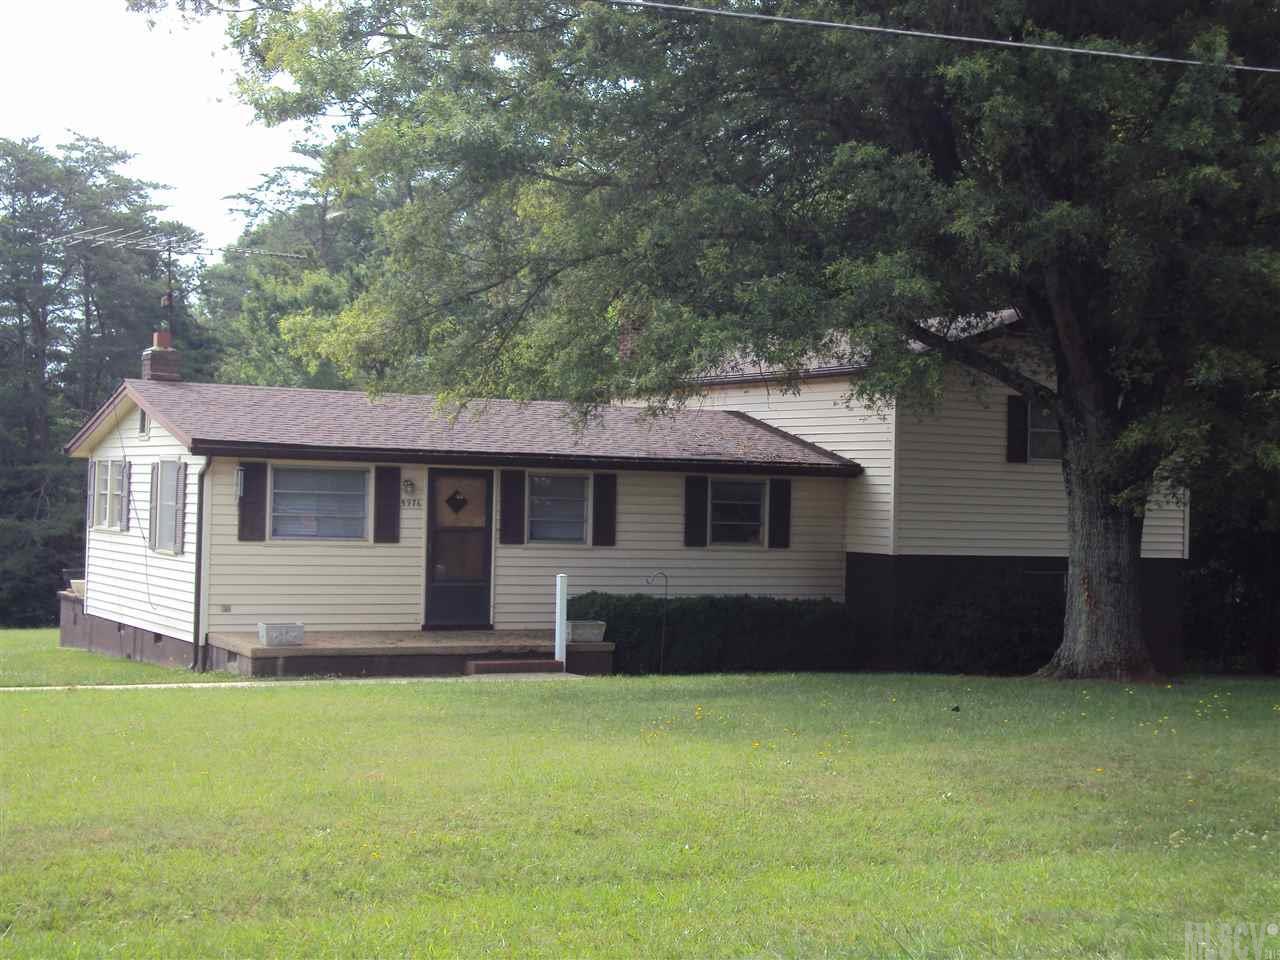 Real Estate for Sale, ListingId:34314775, location: 5976 SWINGING BRIDGE RD Conover 28613